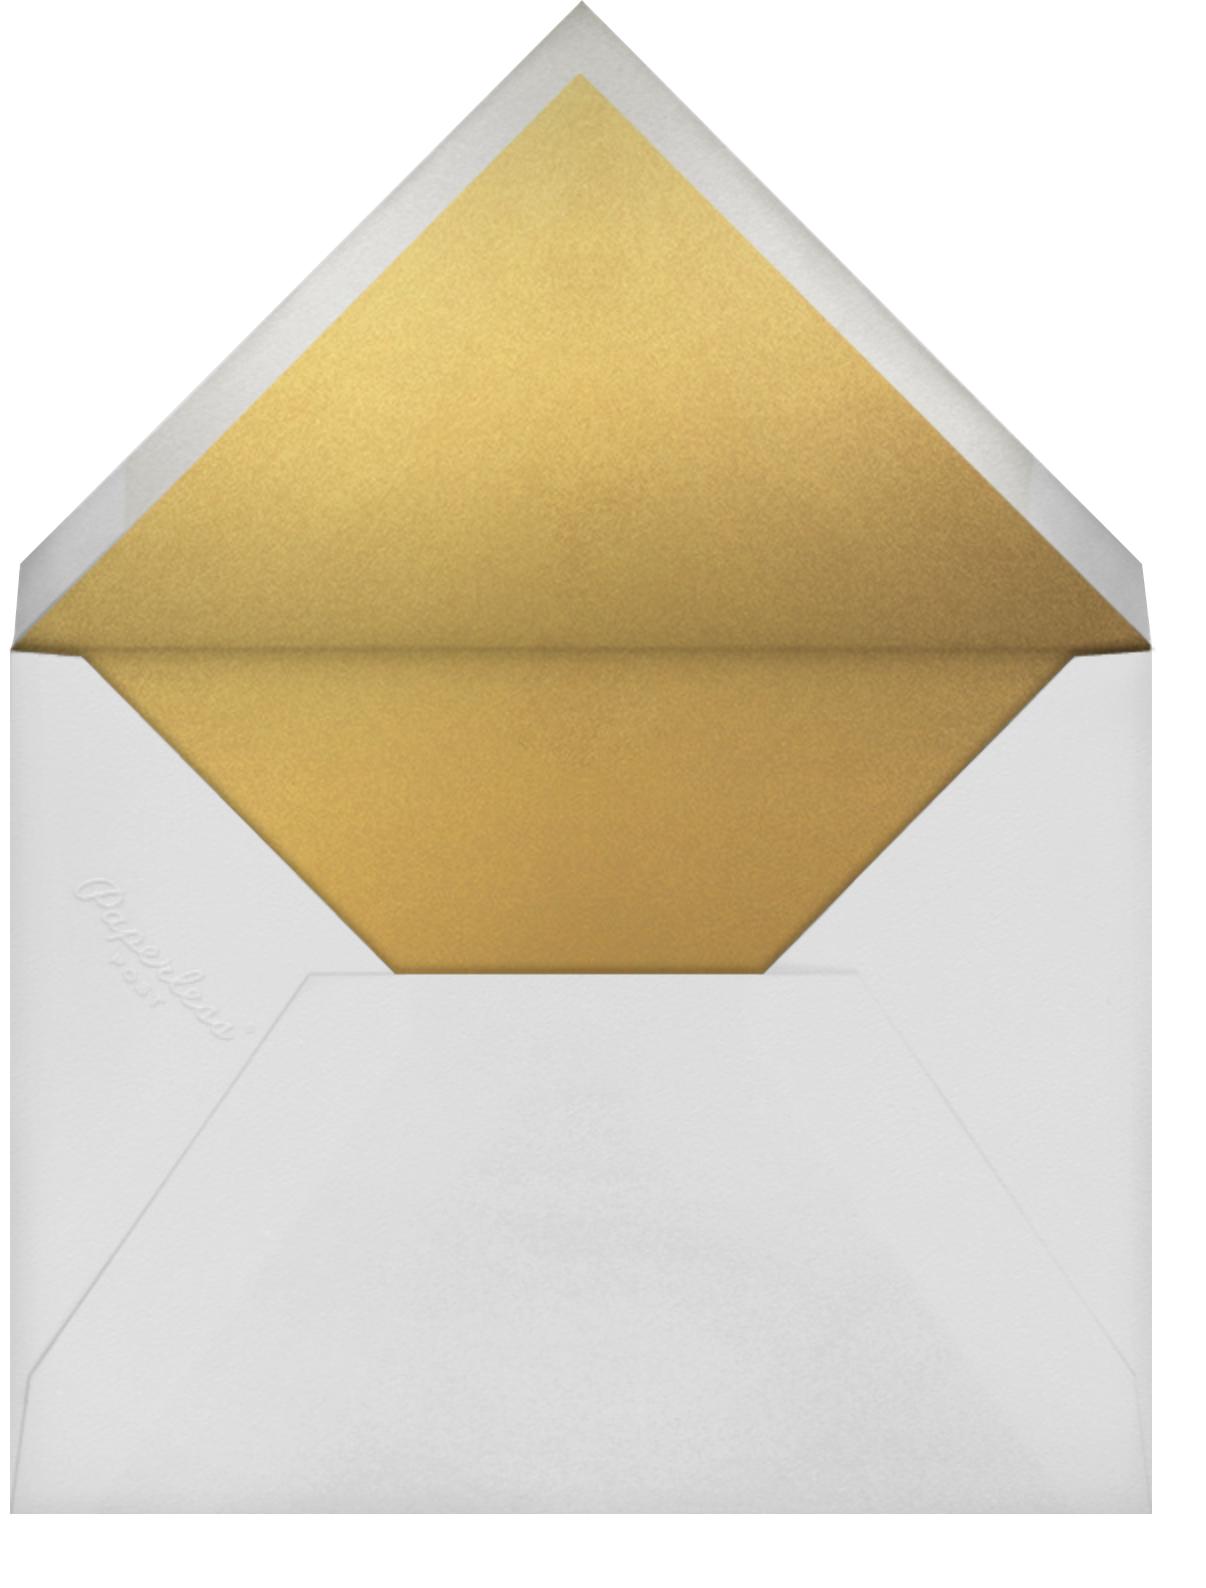 Danaë - Paperless Post - Housewarming - envelope back